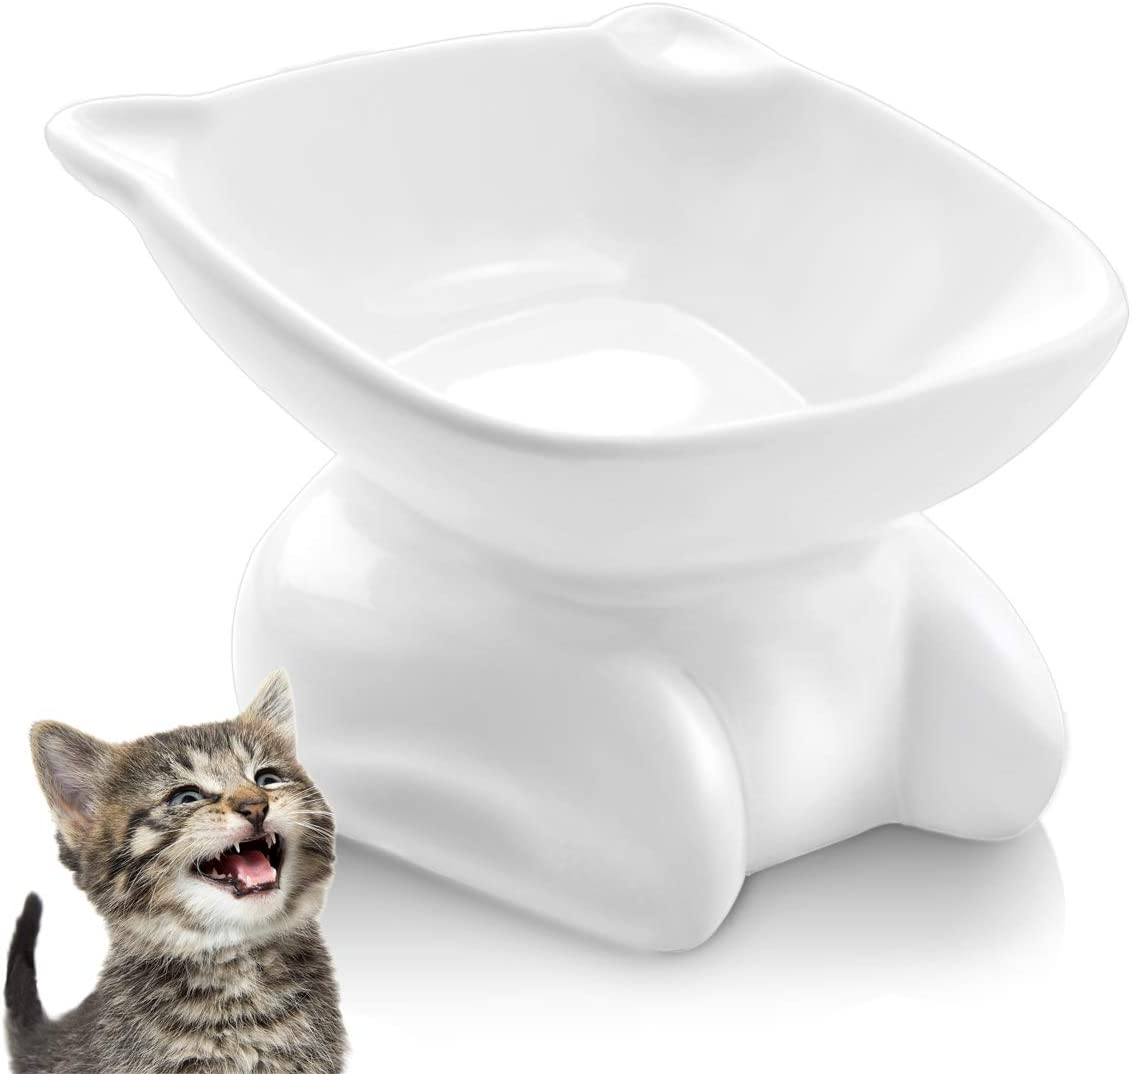 Kitty Cat Food Bowl